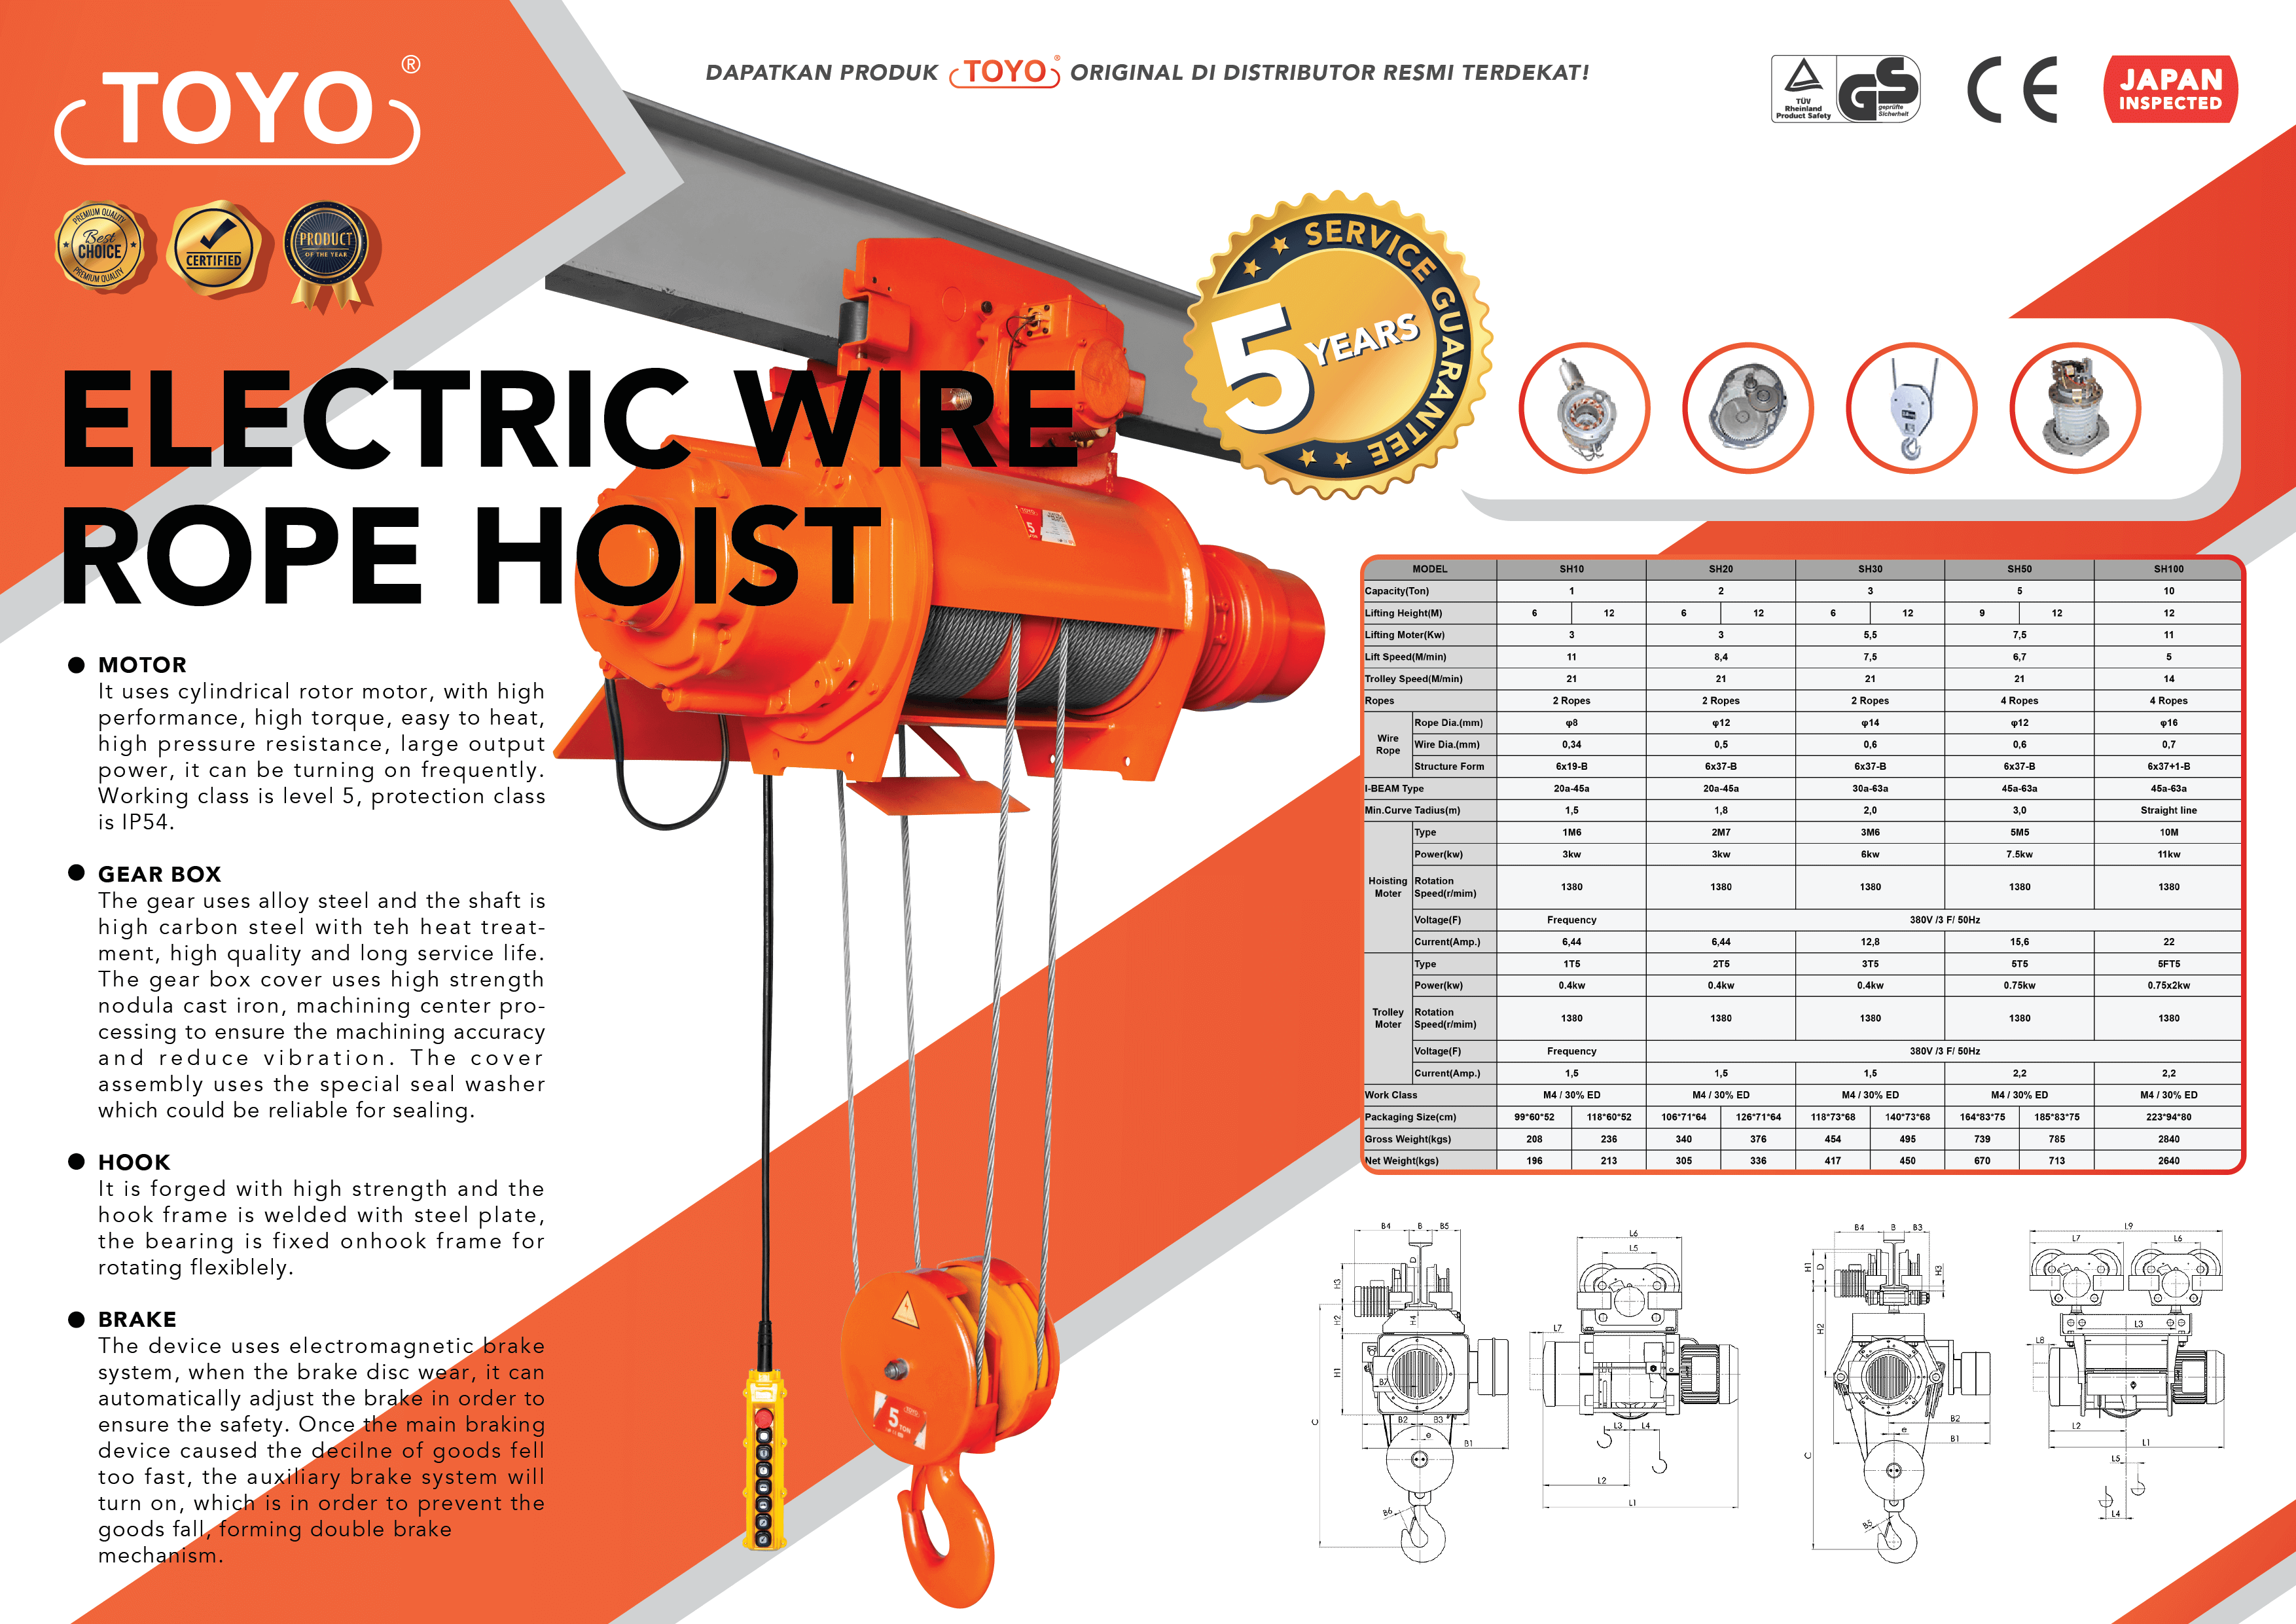 Spesifikasi Detail Electric Wire Rope Hoist Toyo Original